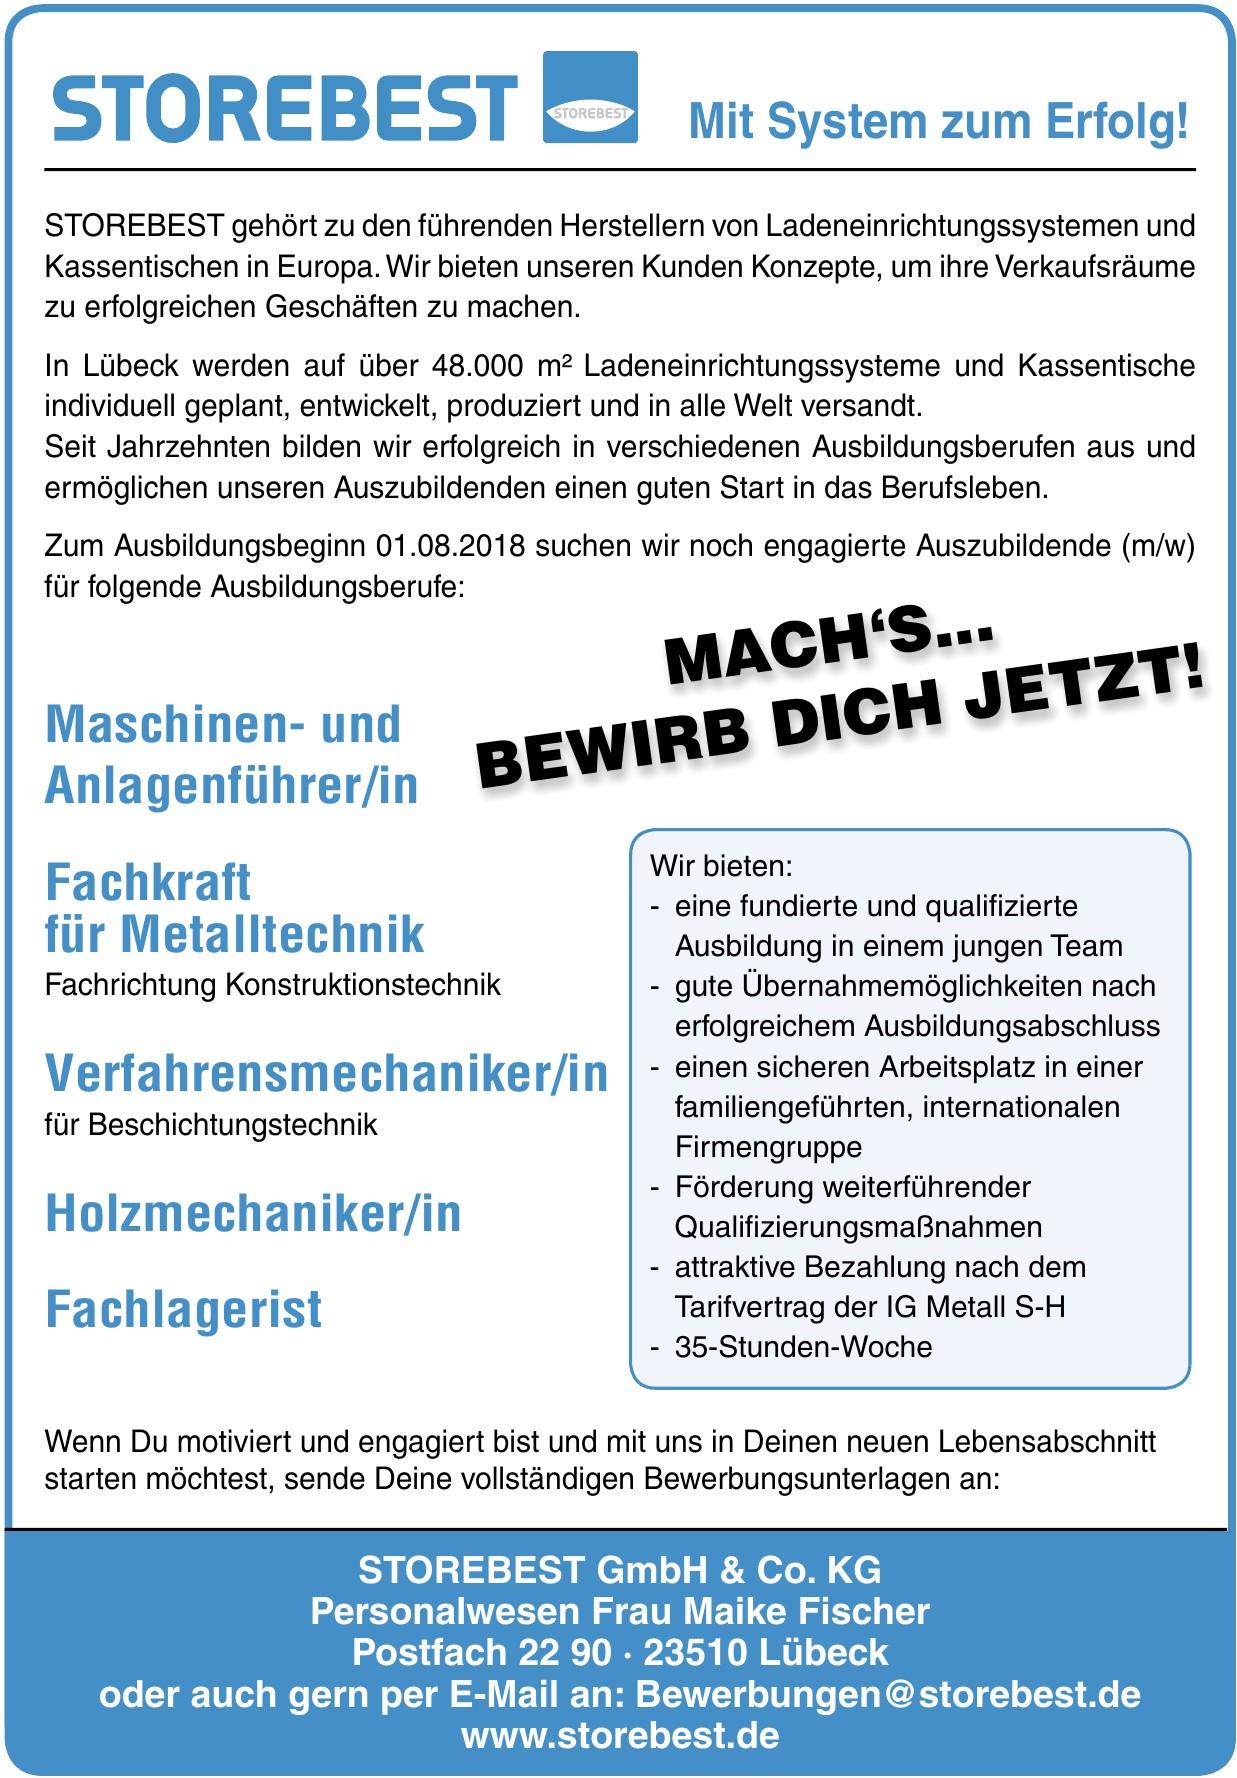 Storebest GmbH & Co. KG